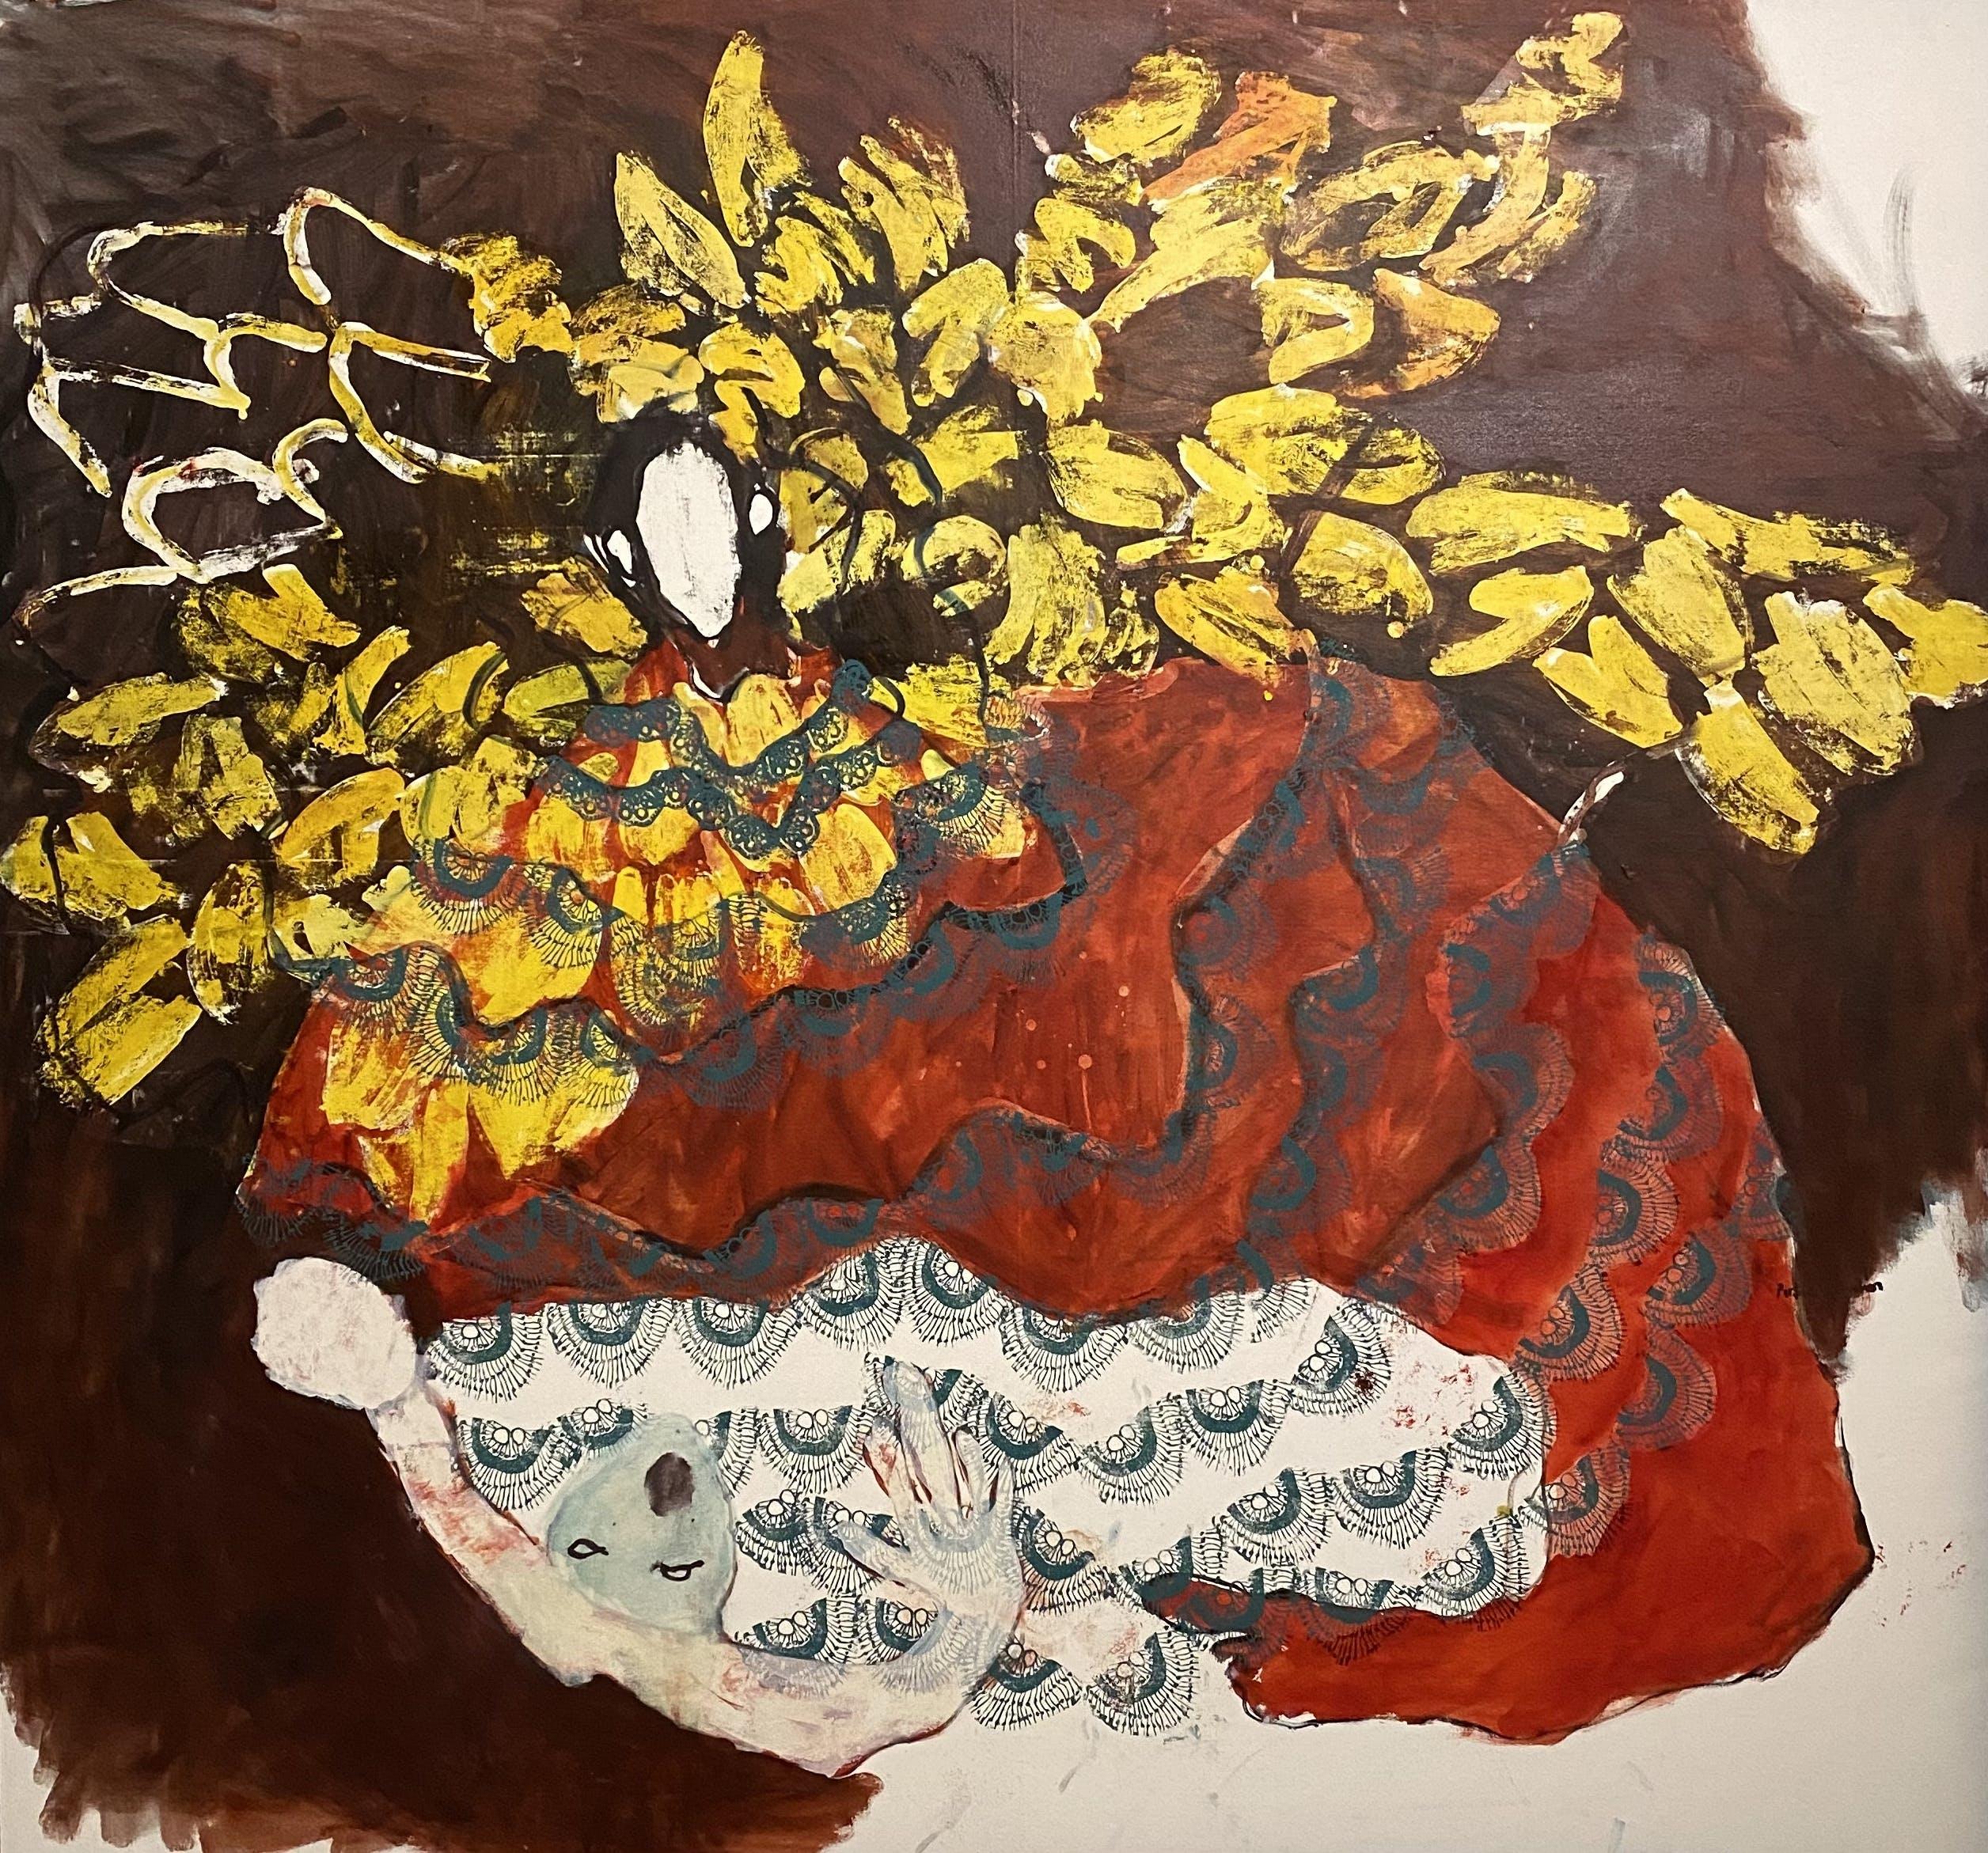 Portia Zvavahera - Arise Spirit Within - The Power Of My Hands - Musée d'Art Moderne de Paris